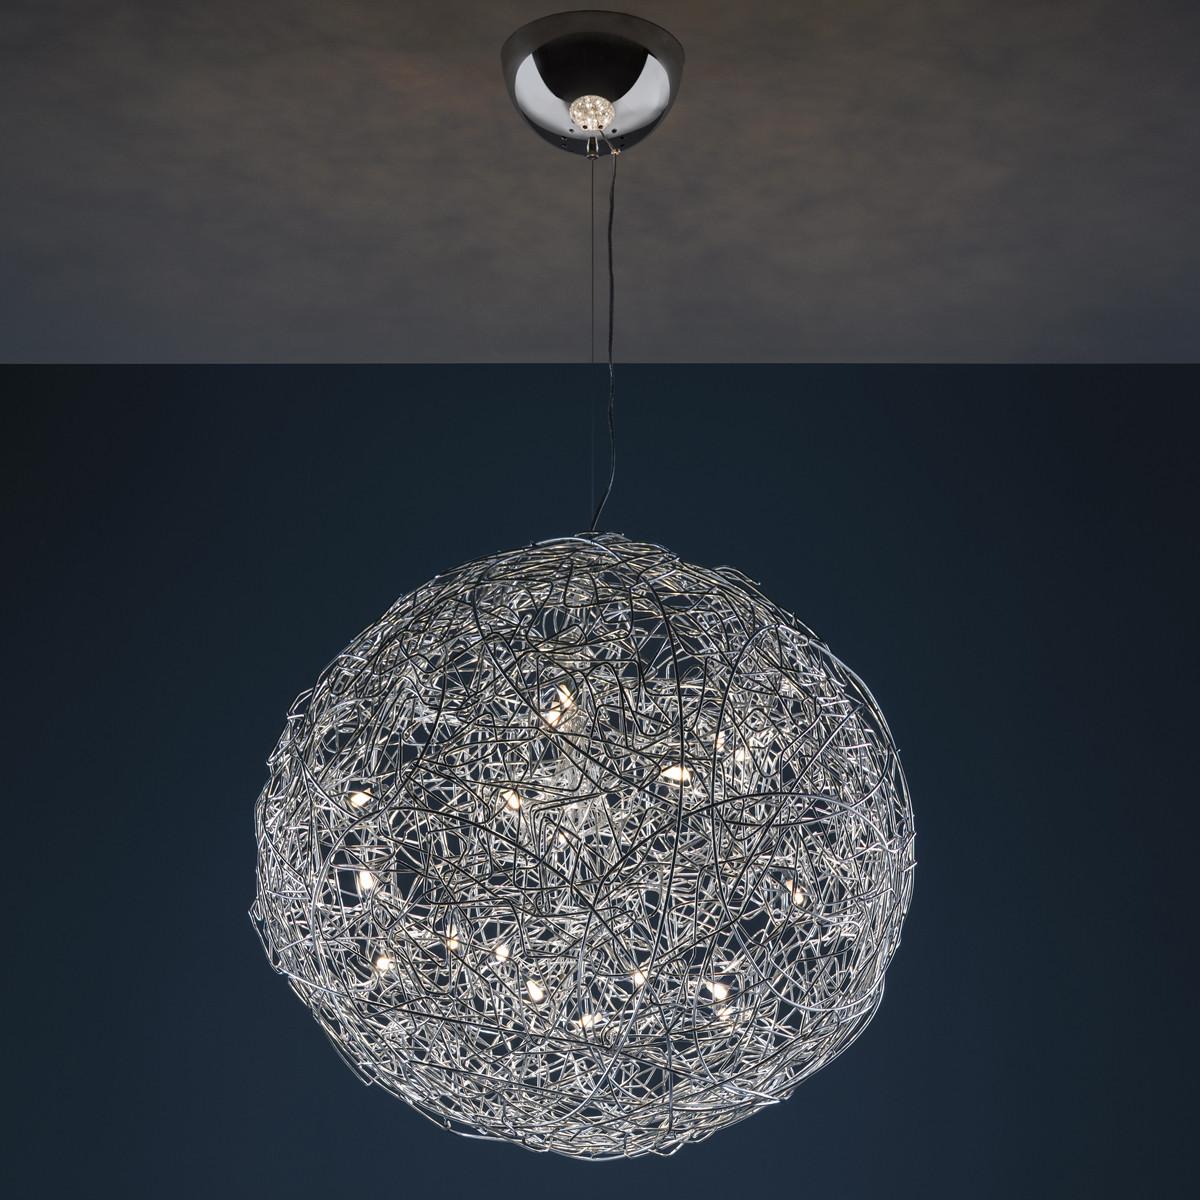 catellani smith fil de fer led pendelleuchte 100 cm casa de. Black Bedroom Furniture Sets. Home Design Ideas